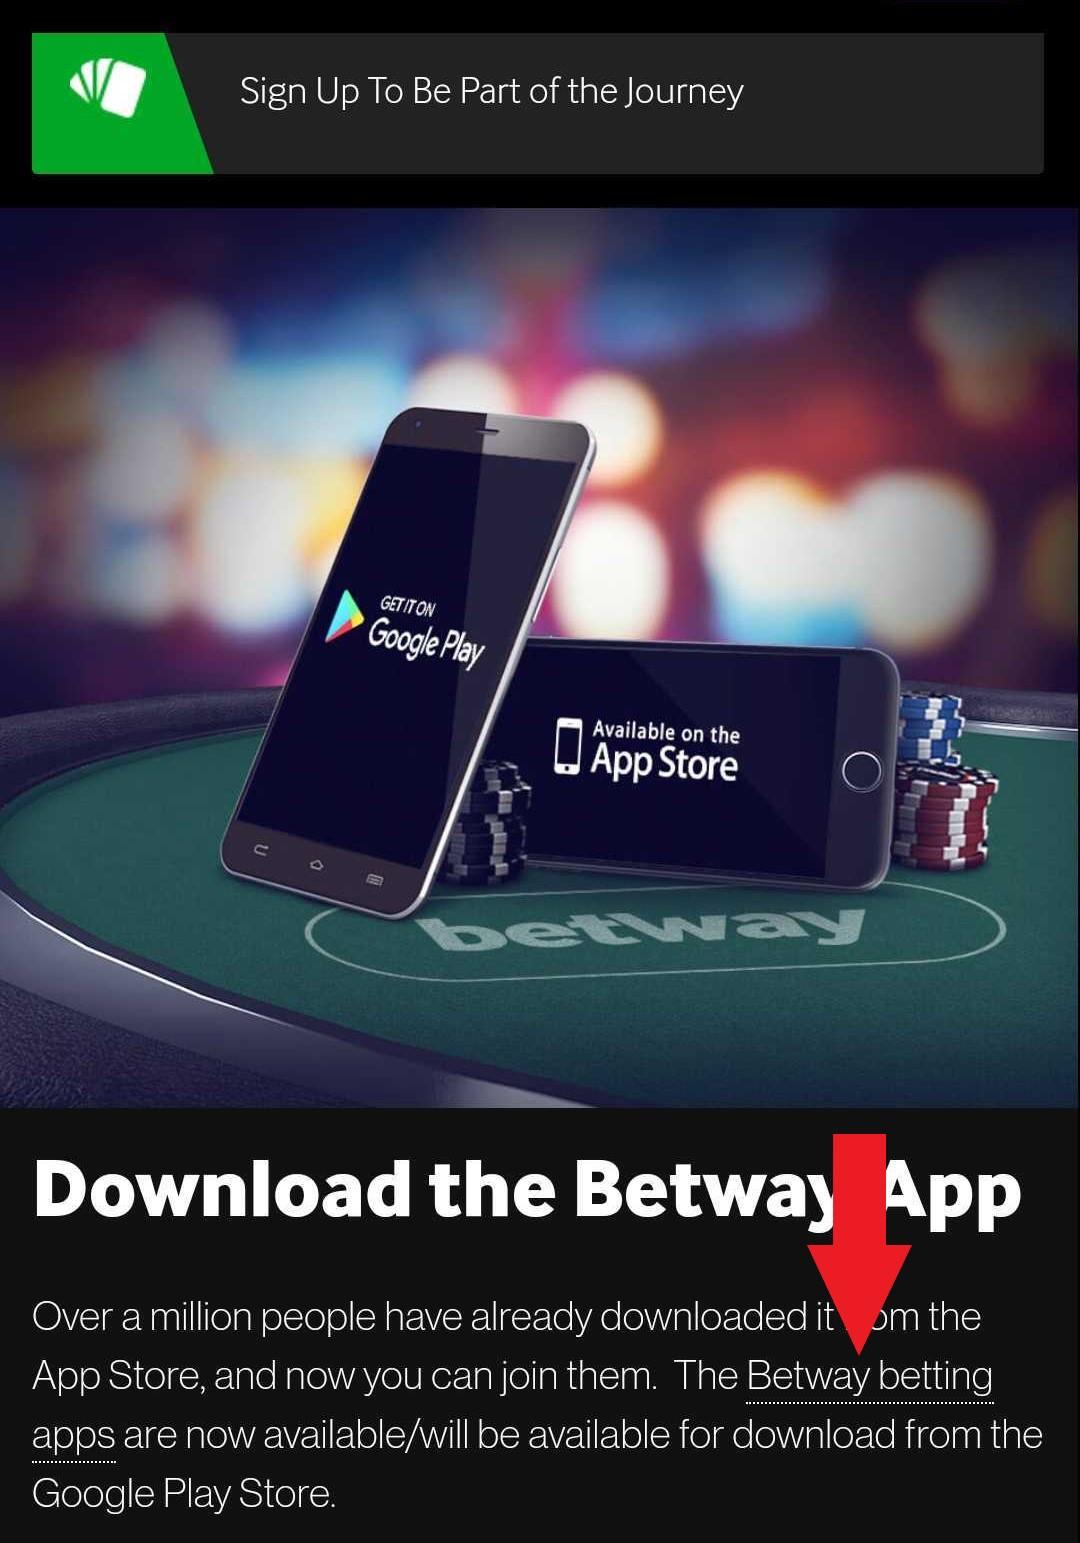 How to download Betway app